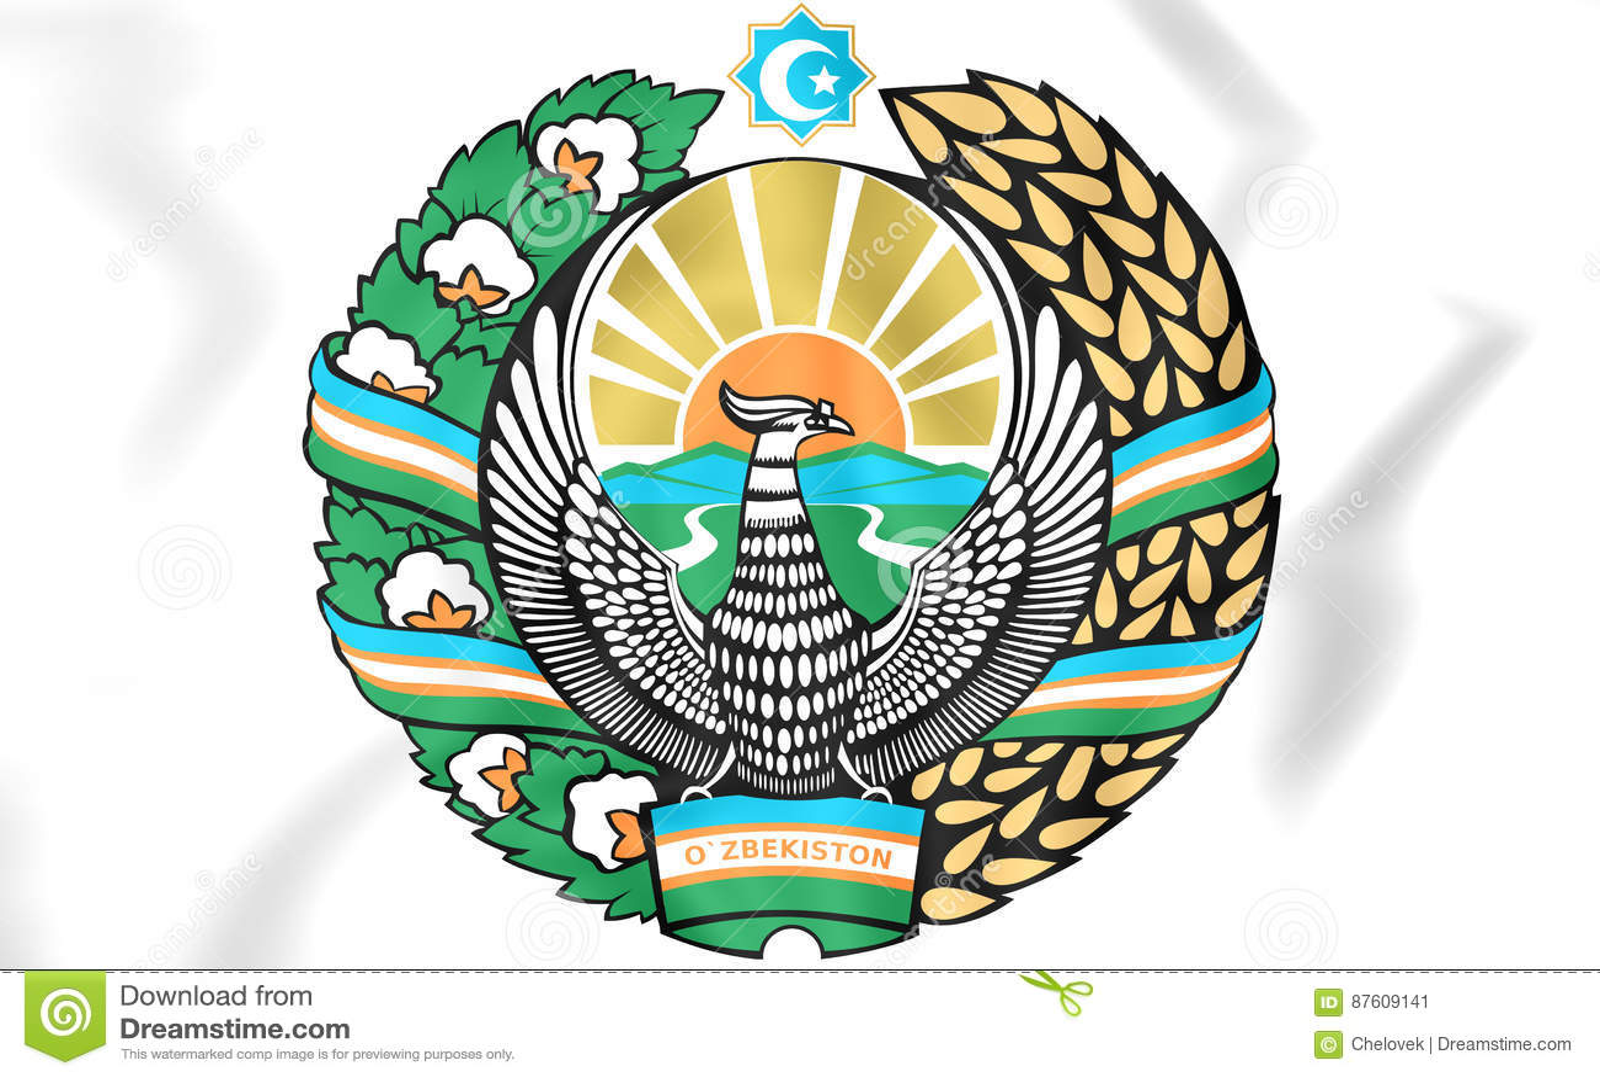 фото герб узбекистана